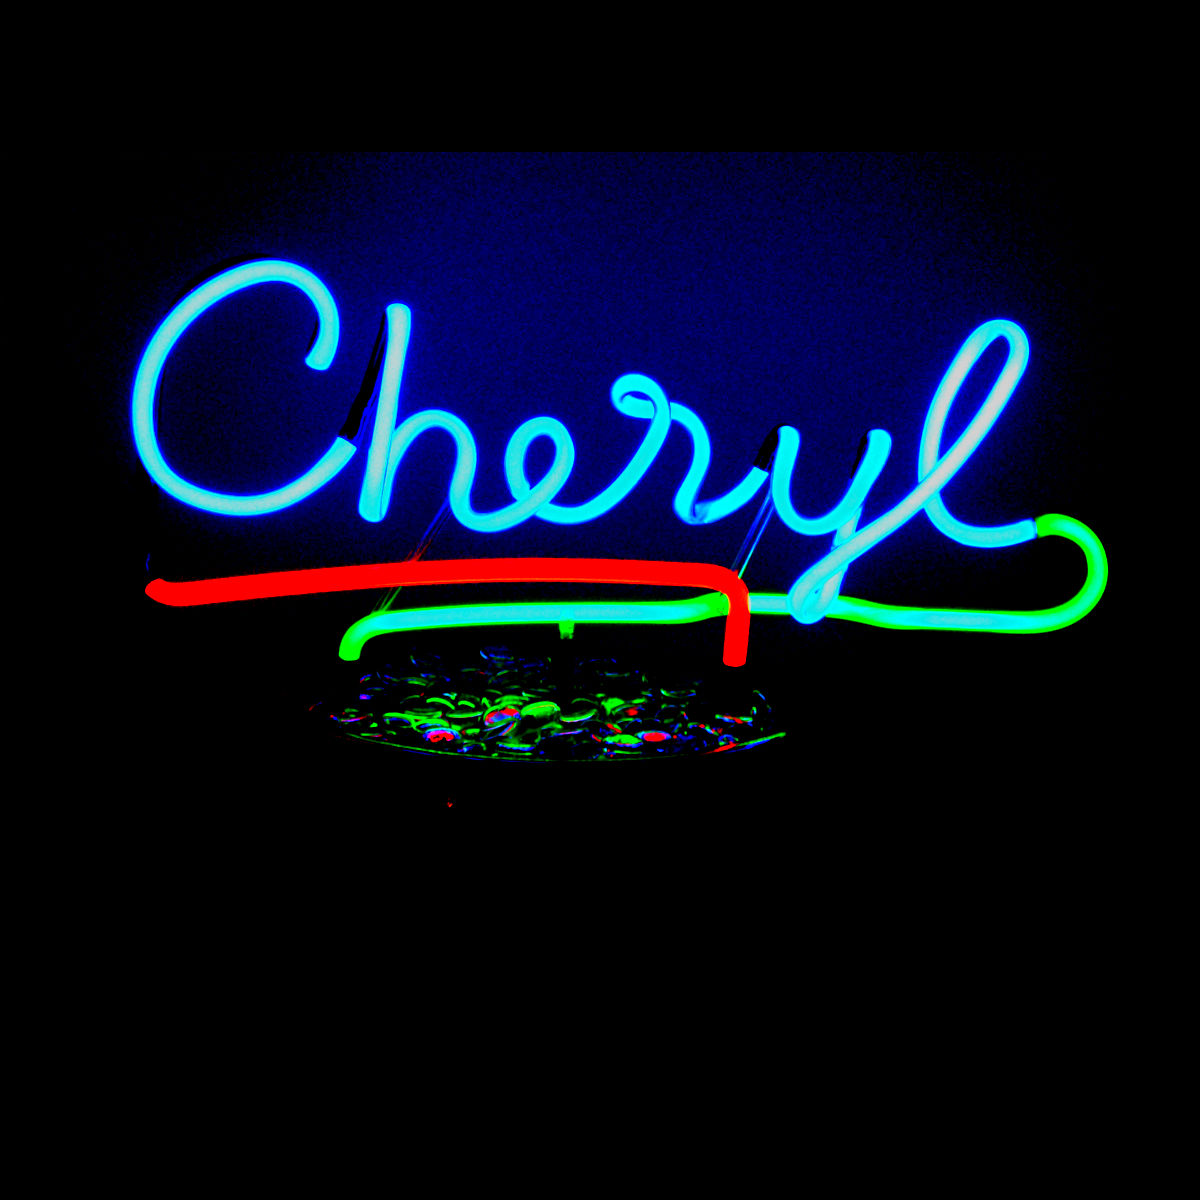 resized Cheryl neon.jpg